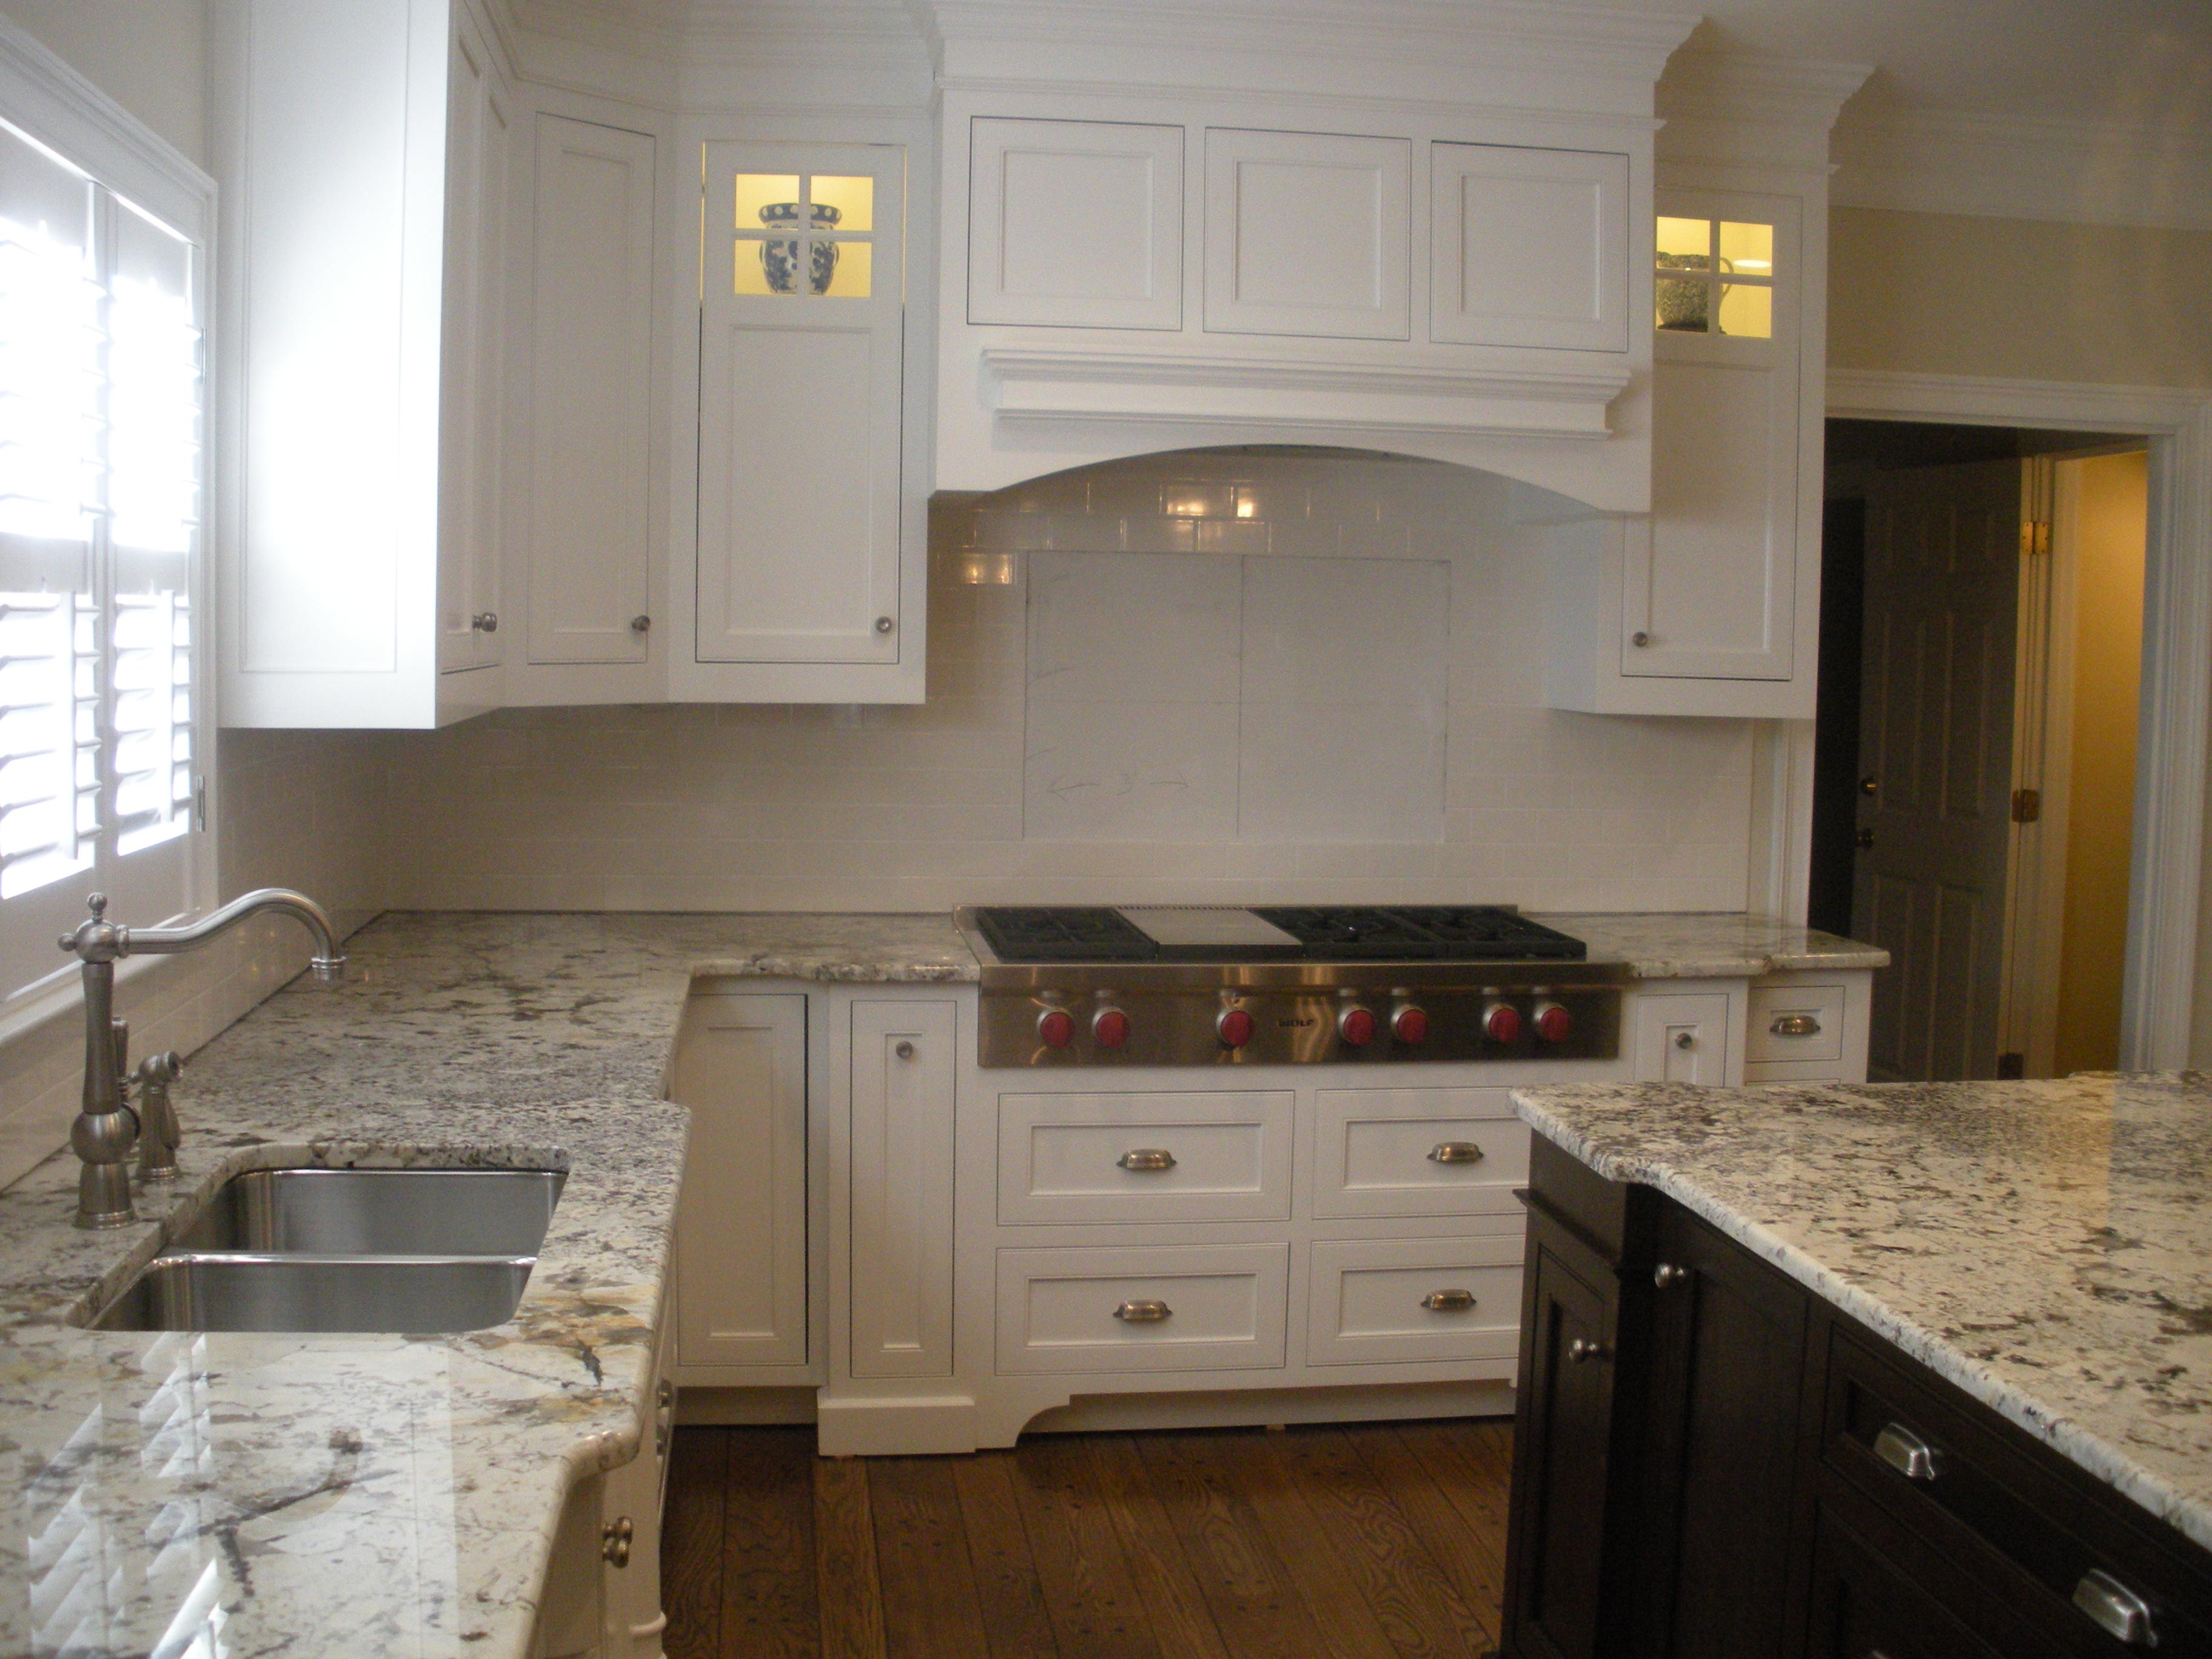 Cabinets In Columbus Ga Peach State Cabinets Quality Custom Cabinets And  Closets . Cabinets In Columbus Ga ...